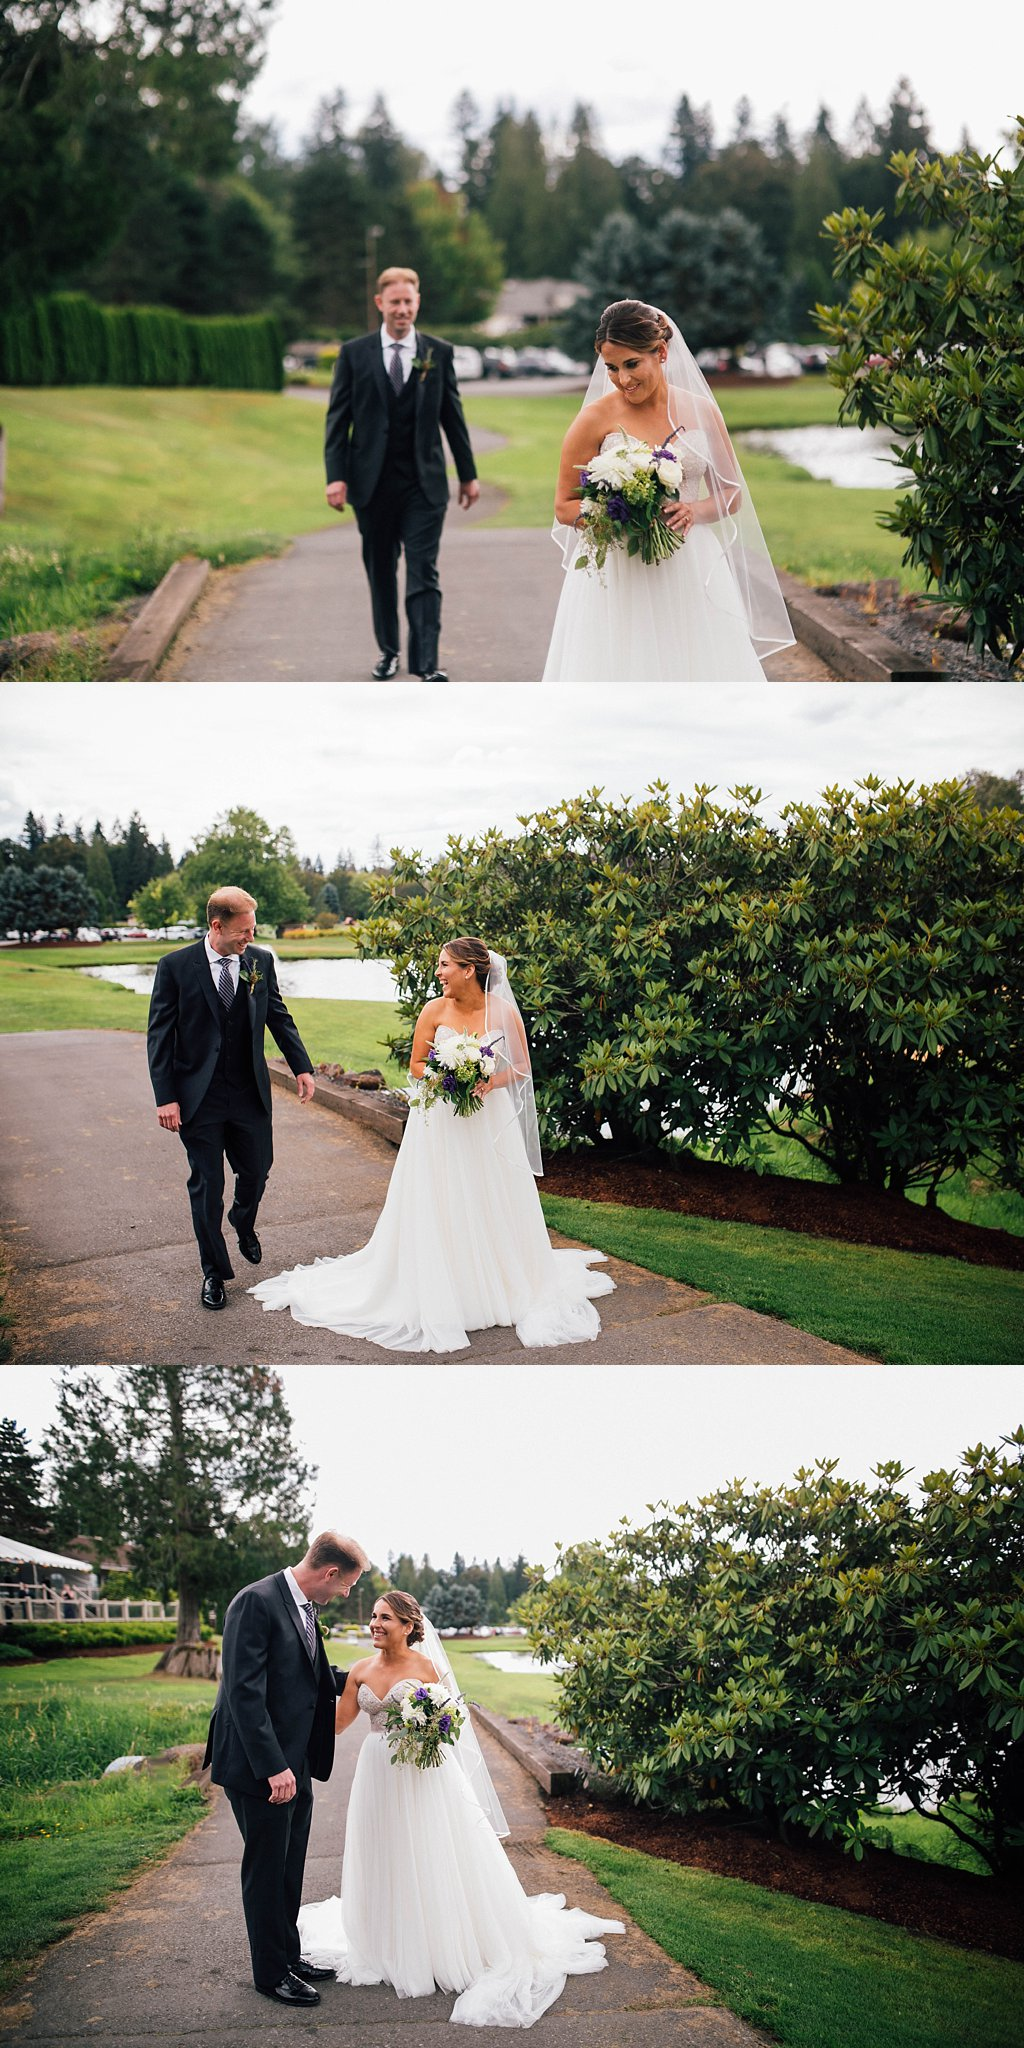 ashley_vos_seattle_wedding_photographer_0091.jpg